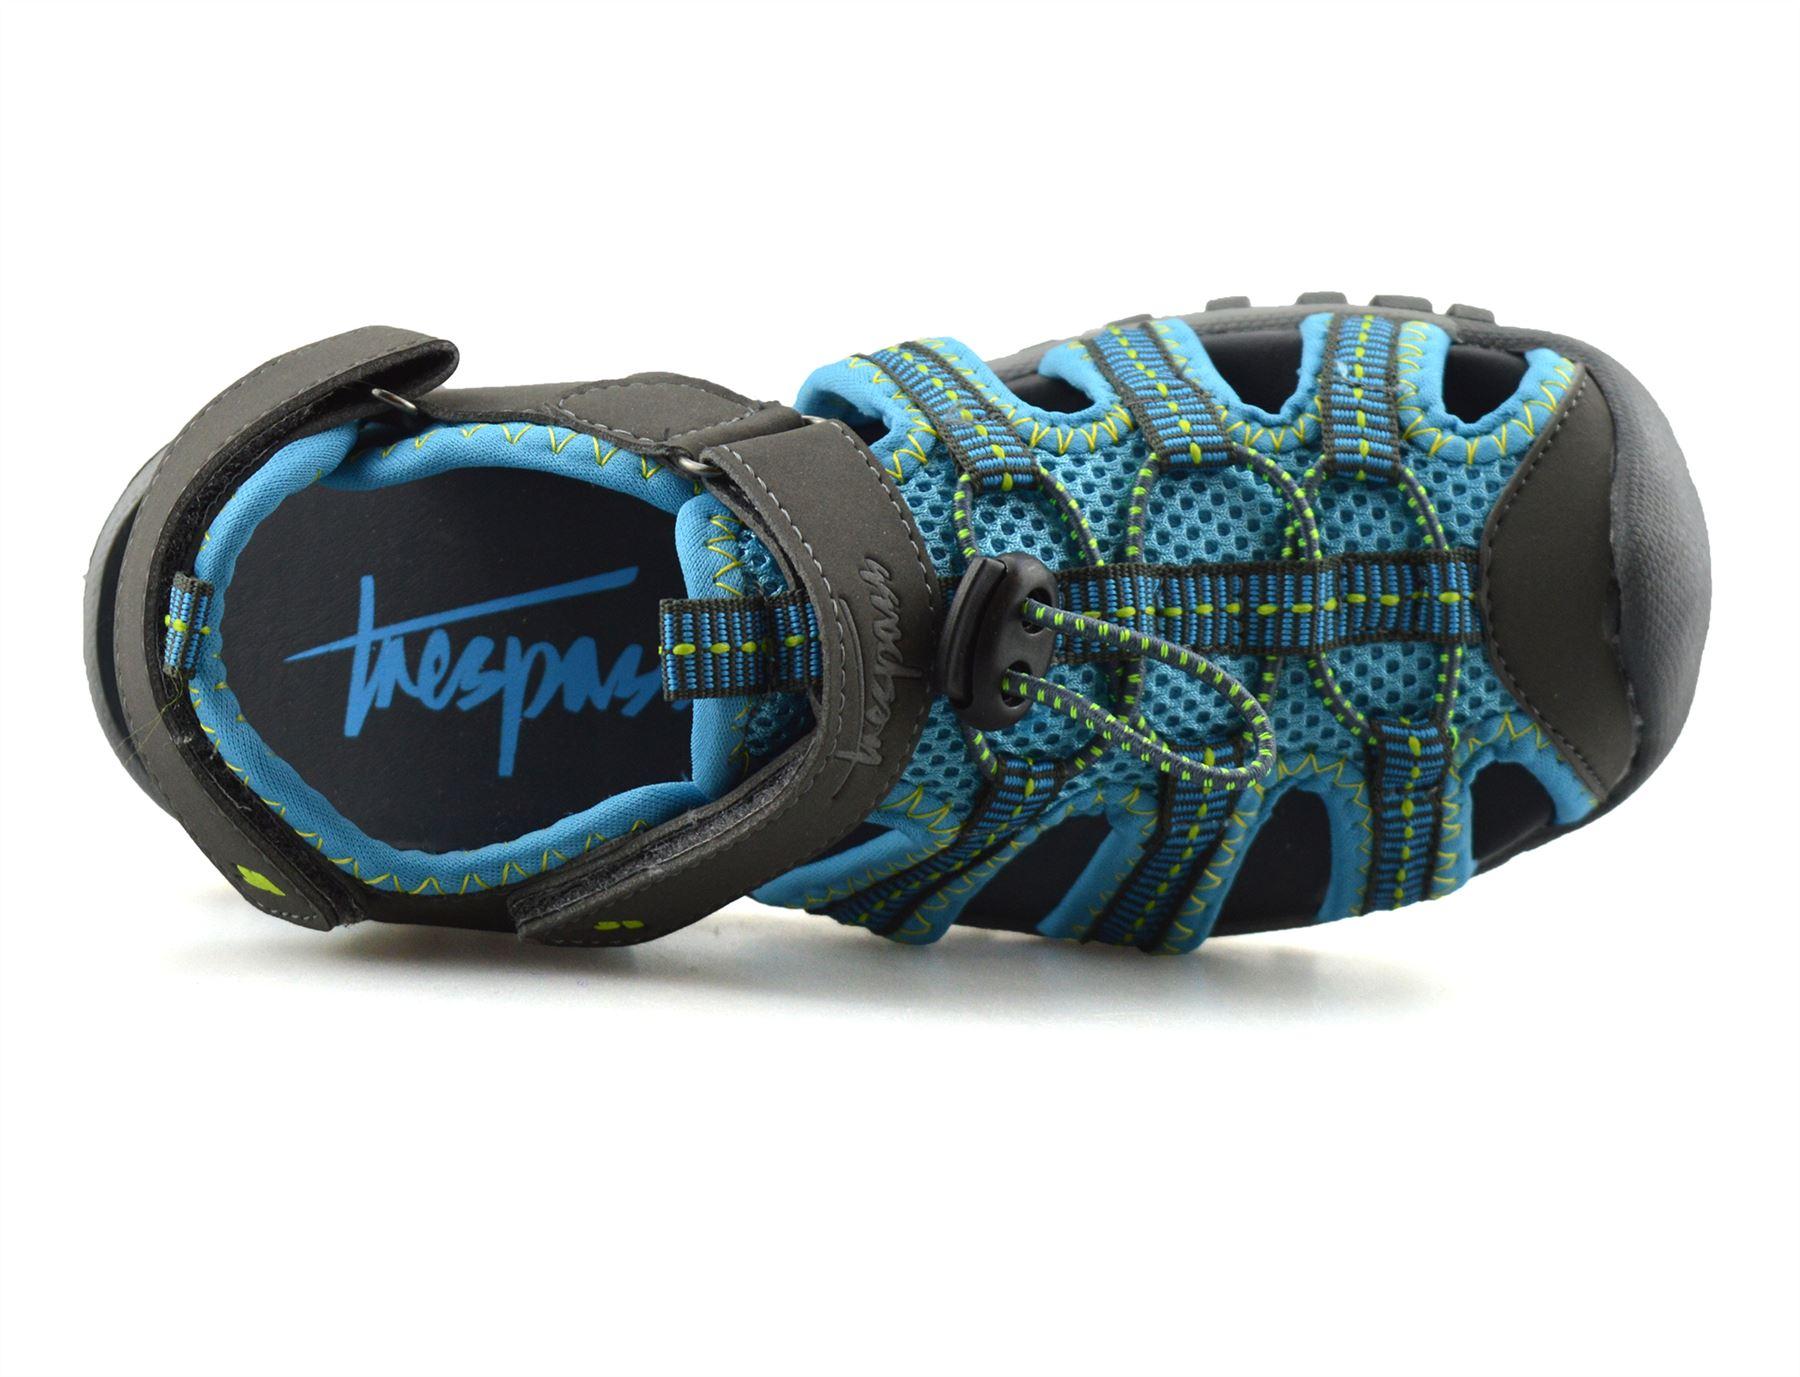 Boys-Girls-Kids-Trespass-Summer-Beach-Casual-Walking-Sports-Sandals-Shoes-Size thumbnail 25